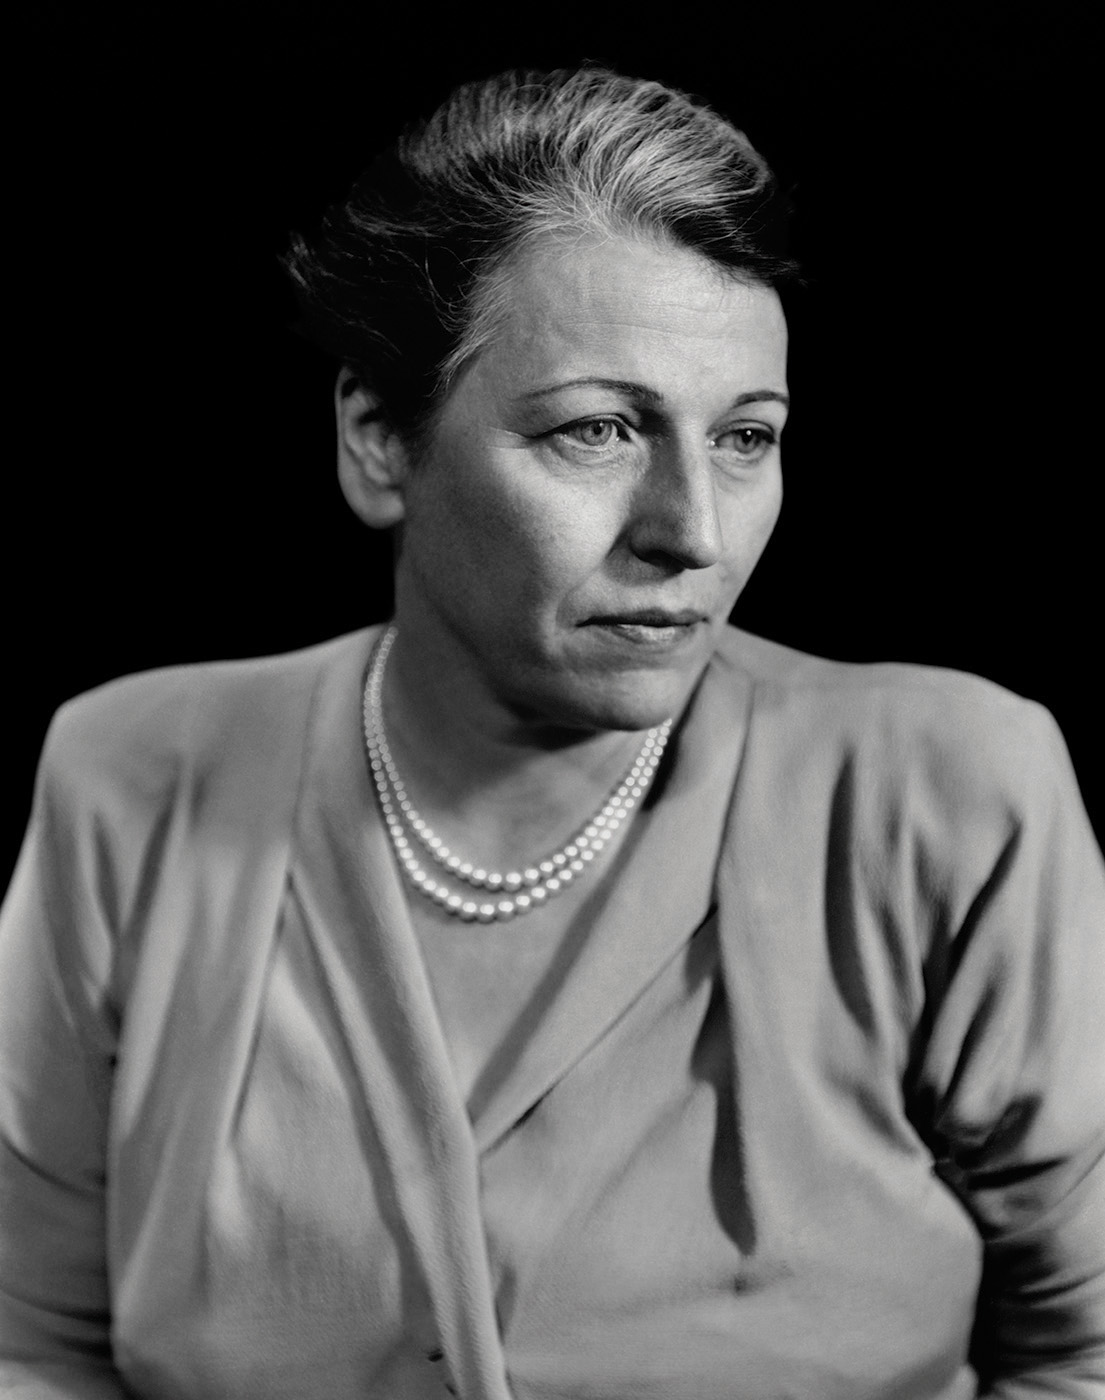 Pearl S. Buck, New York, 1948